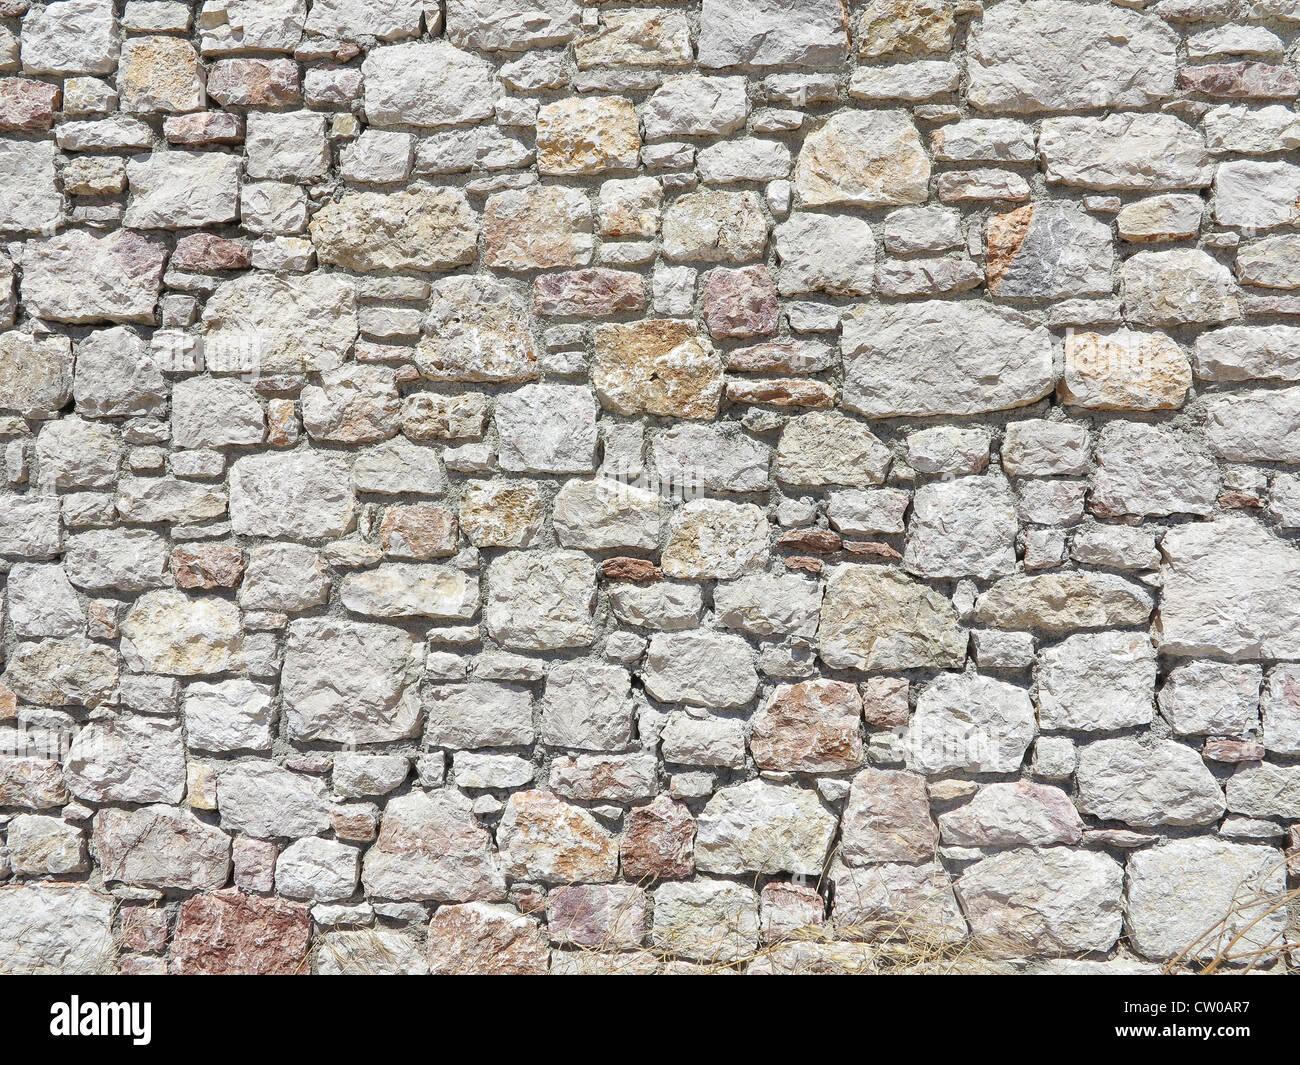 block stone wall made from irregular sized stone blocks stock photo